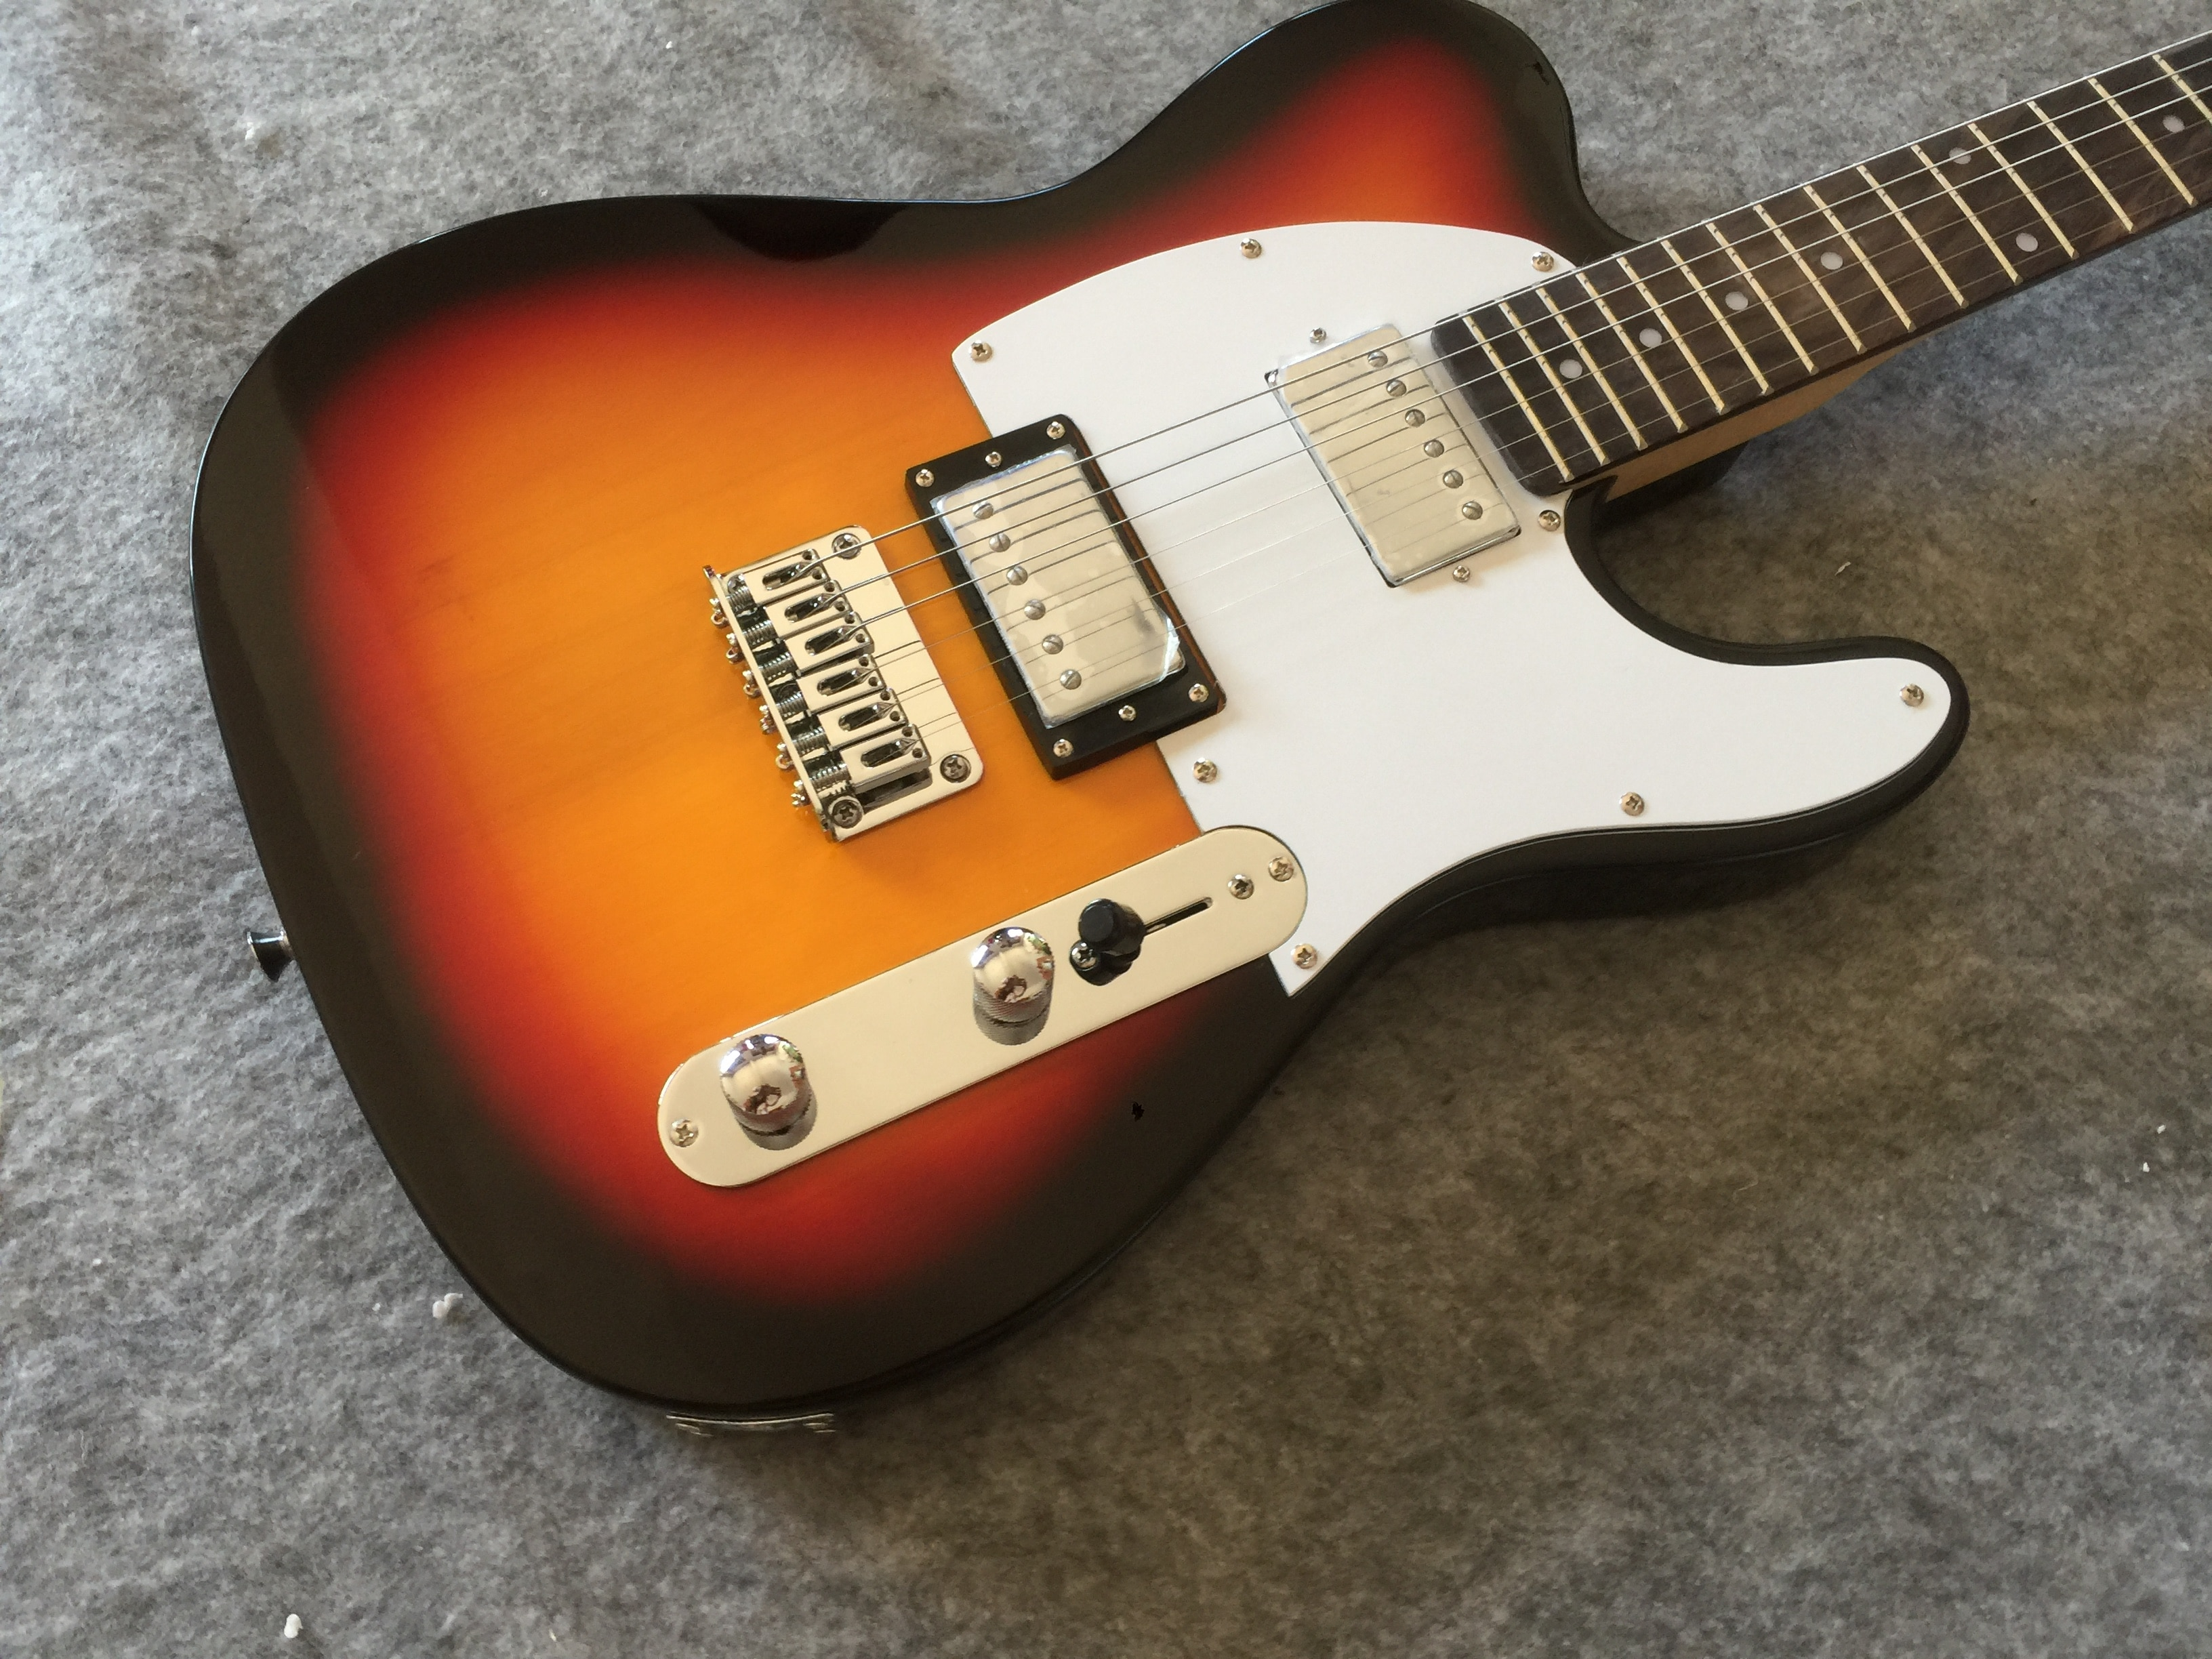 Electric guitar / sunset dual pickup TL Guitar / customizable Chinese electric guitar enlarge